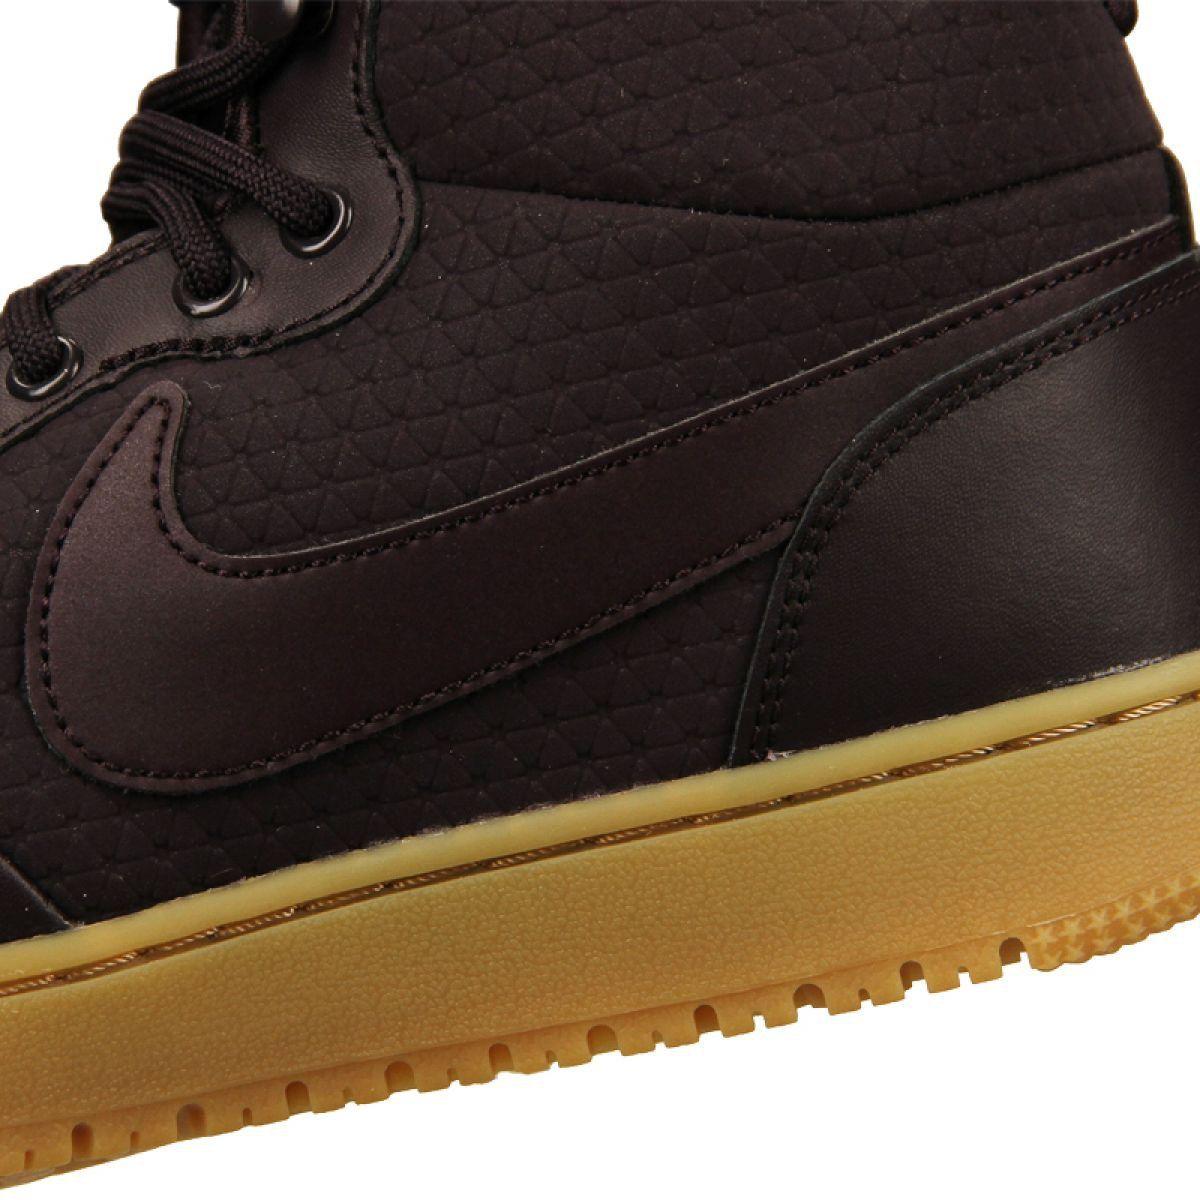 Nike Ebernon Mid Winter M Aq8754 600 Shoes Mens Nike Shoes Shoes Nike